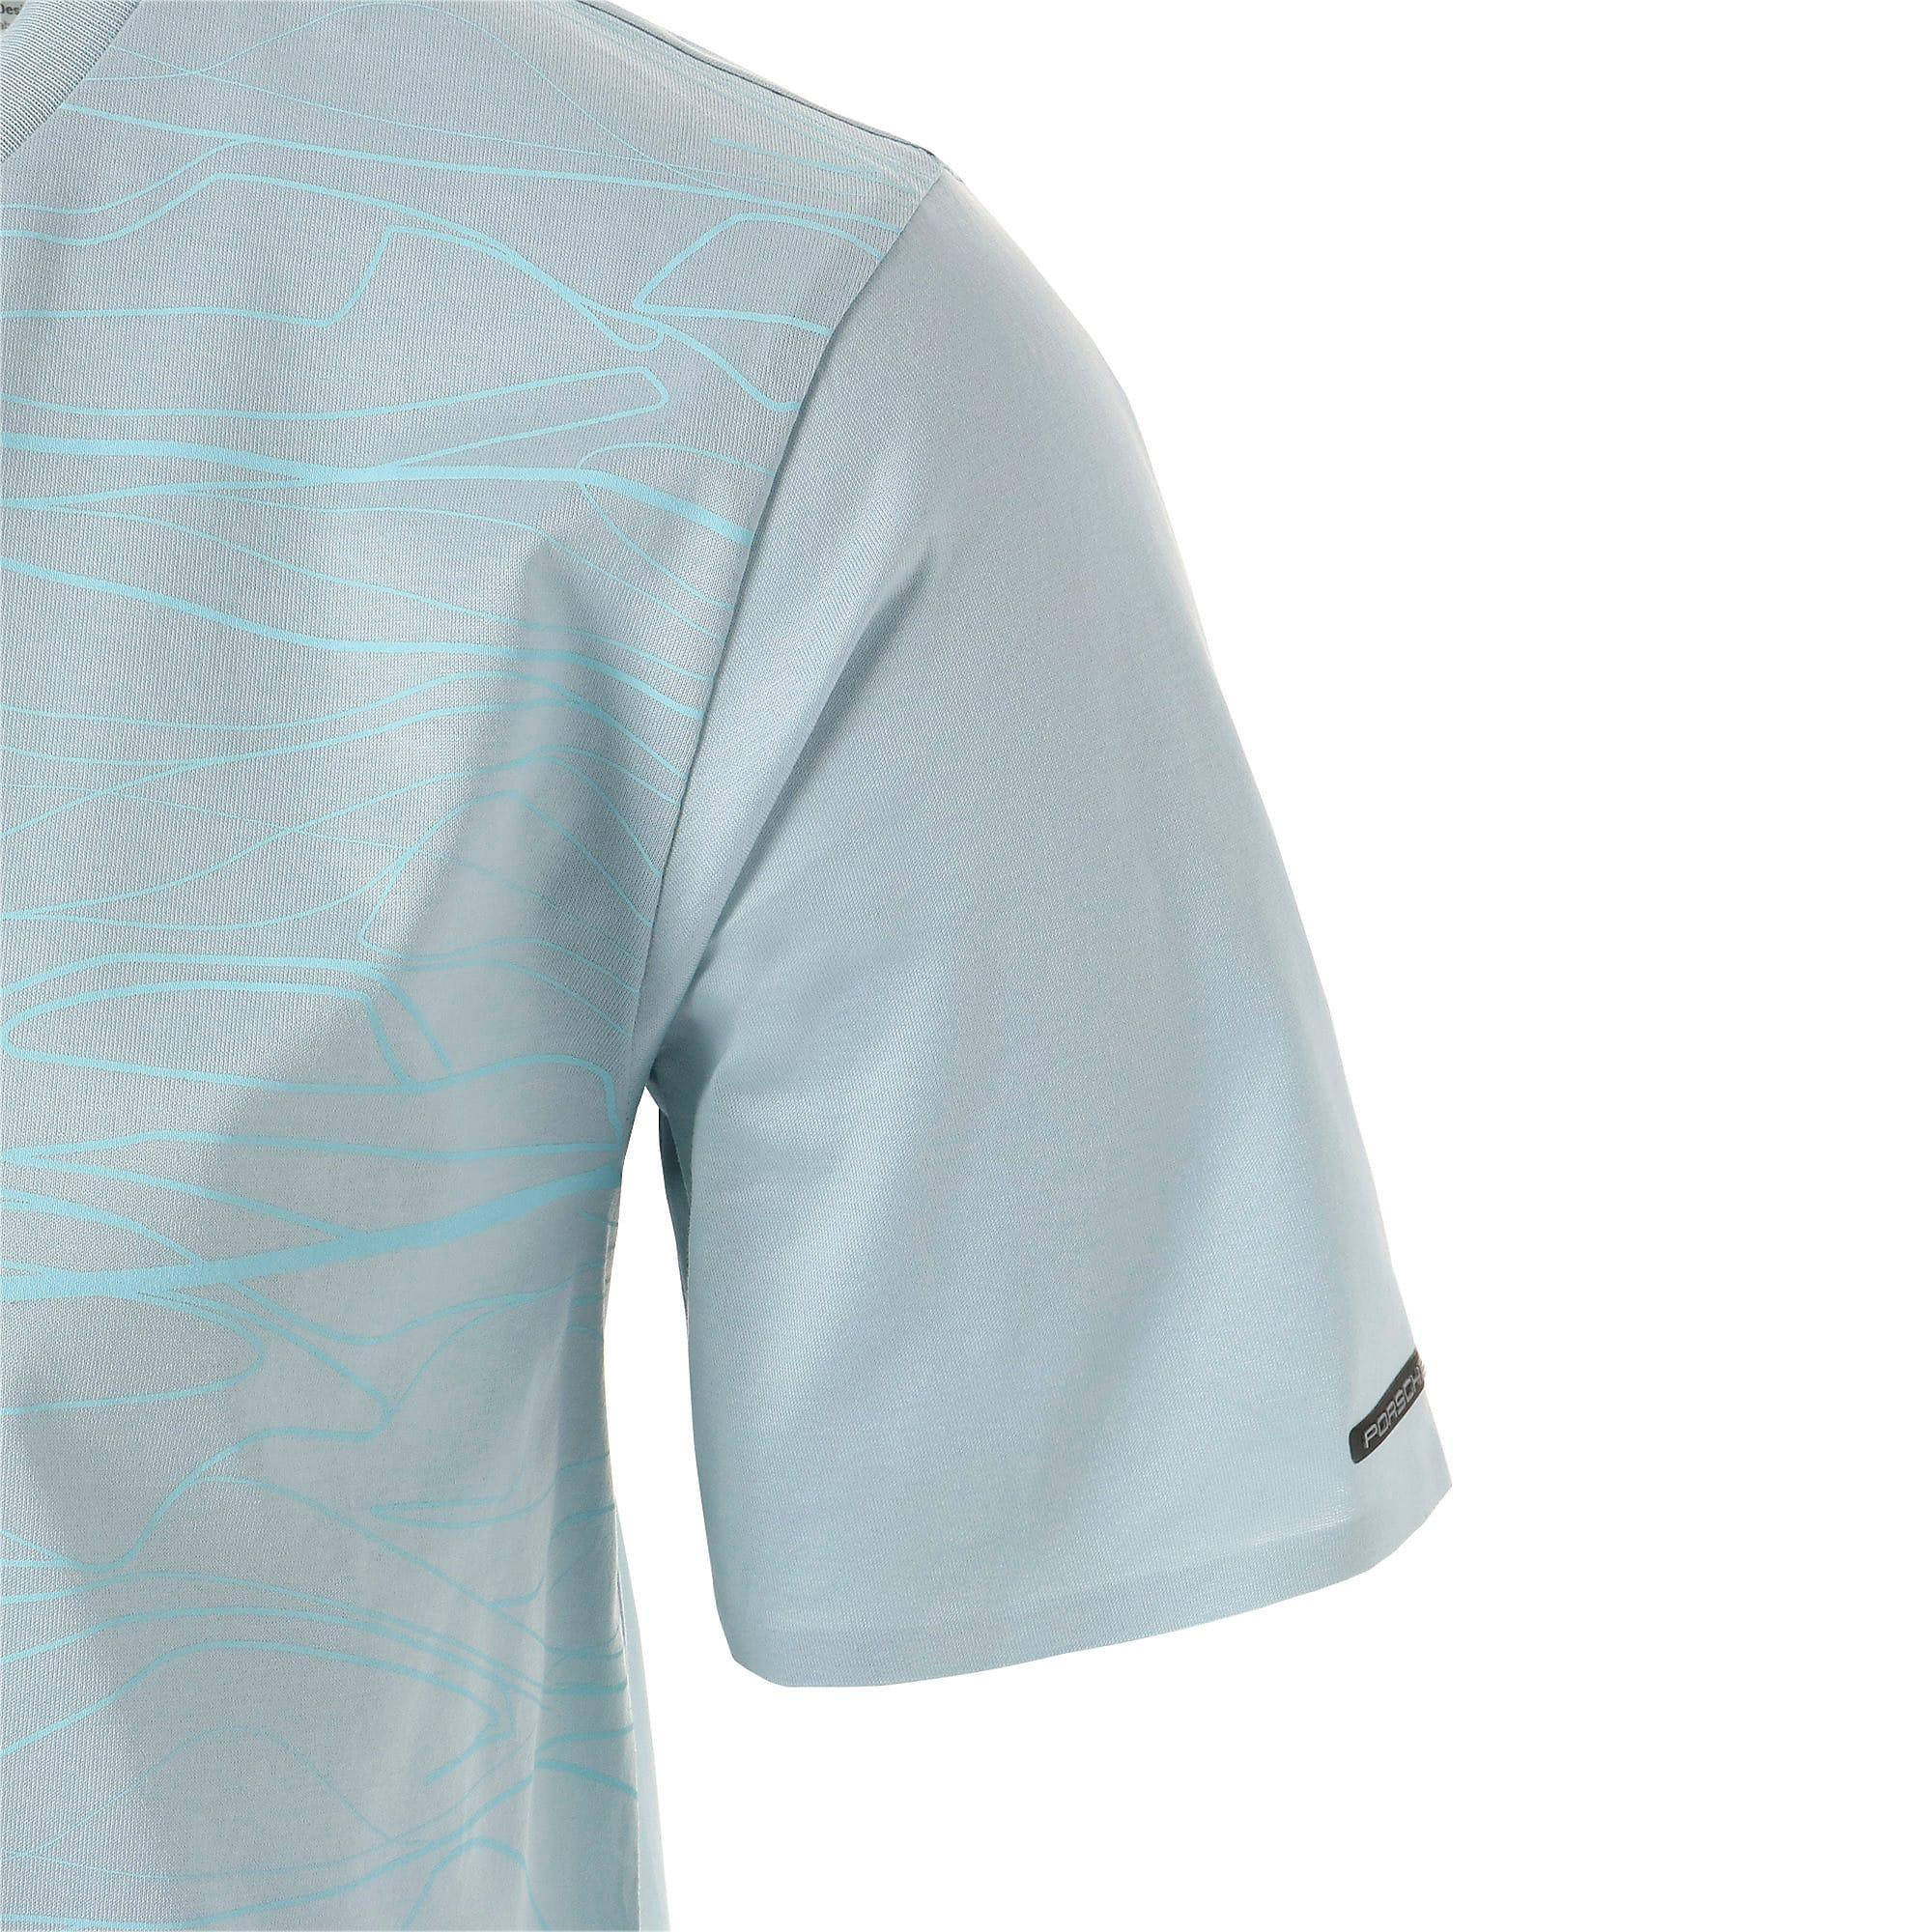 Thumbnail 5 of PORSCHE DESIGN  グラフィック Tシャツ, Light Sky, medium-JPN